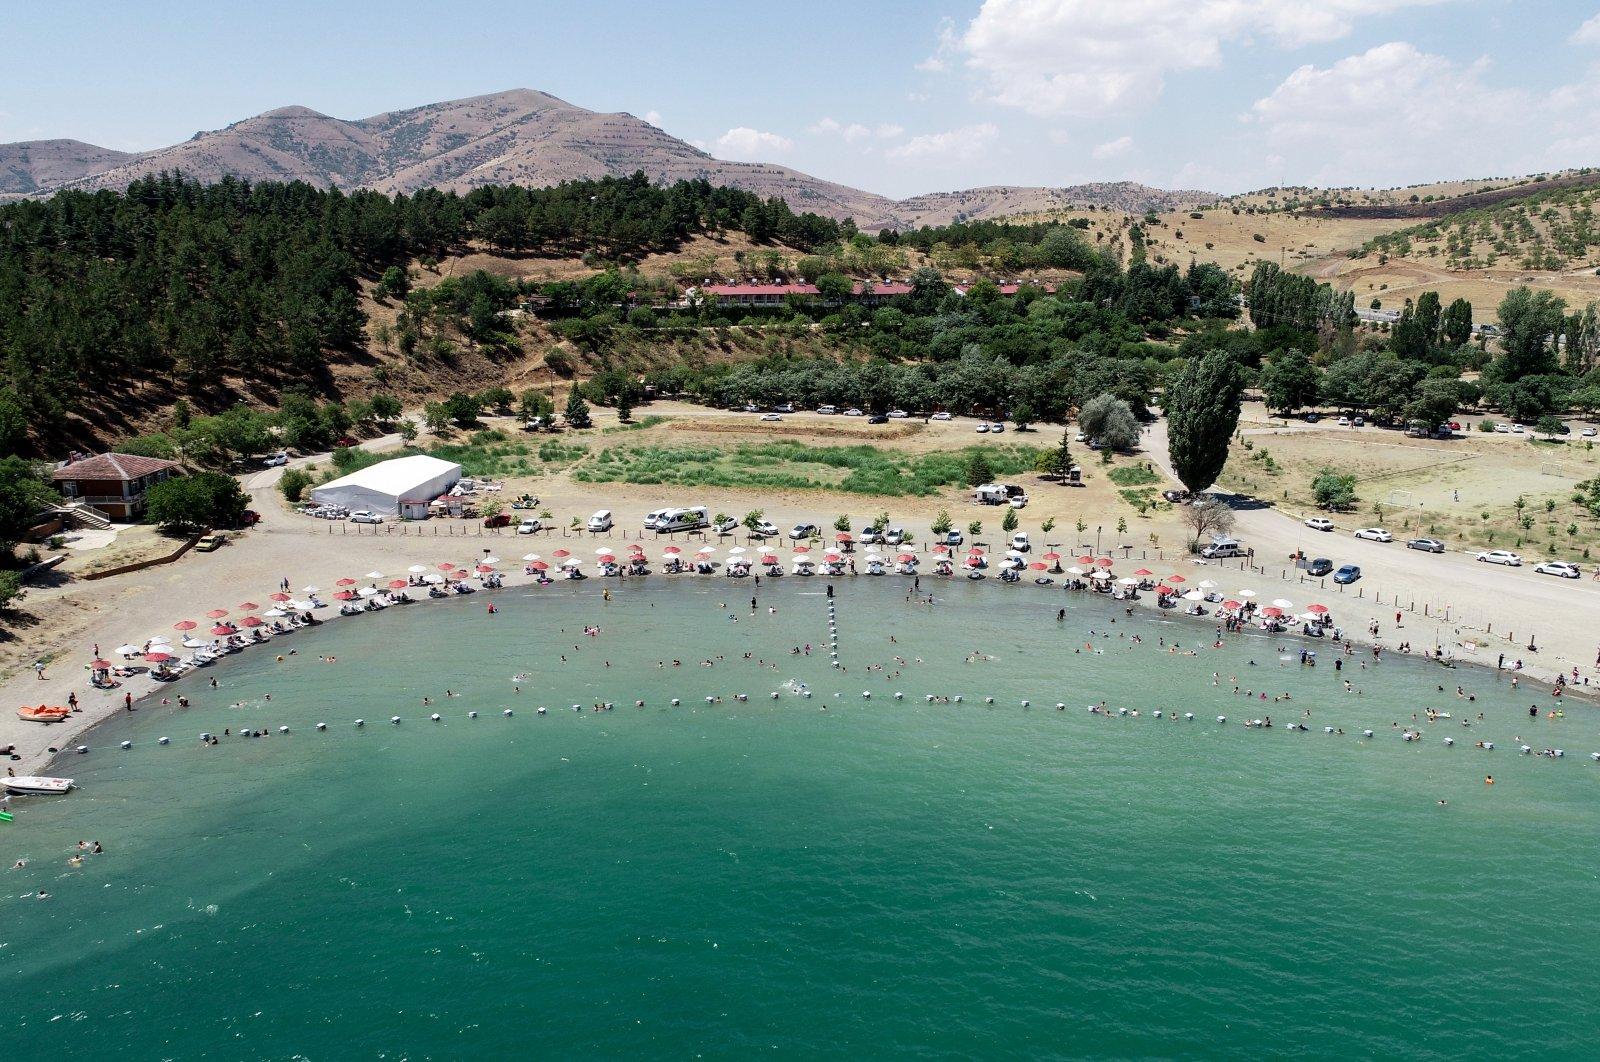 Vacationers on sunbeds are seen at Lake Hazar in Elazığ province, eastern Turkey, Aug. 7, 2020. (AA Photo)